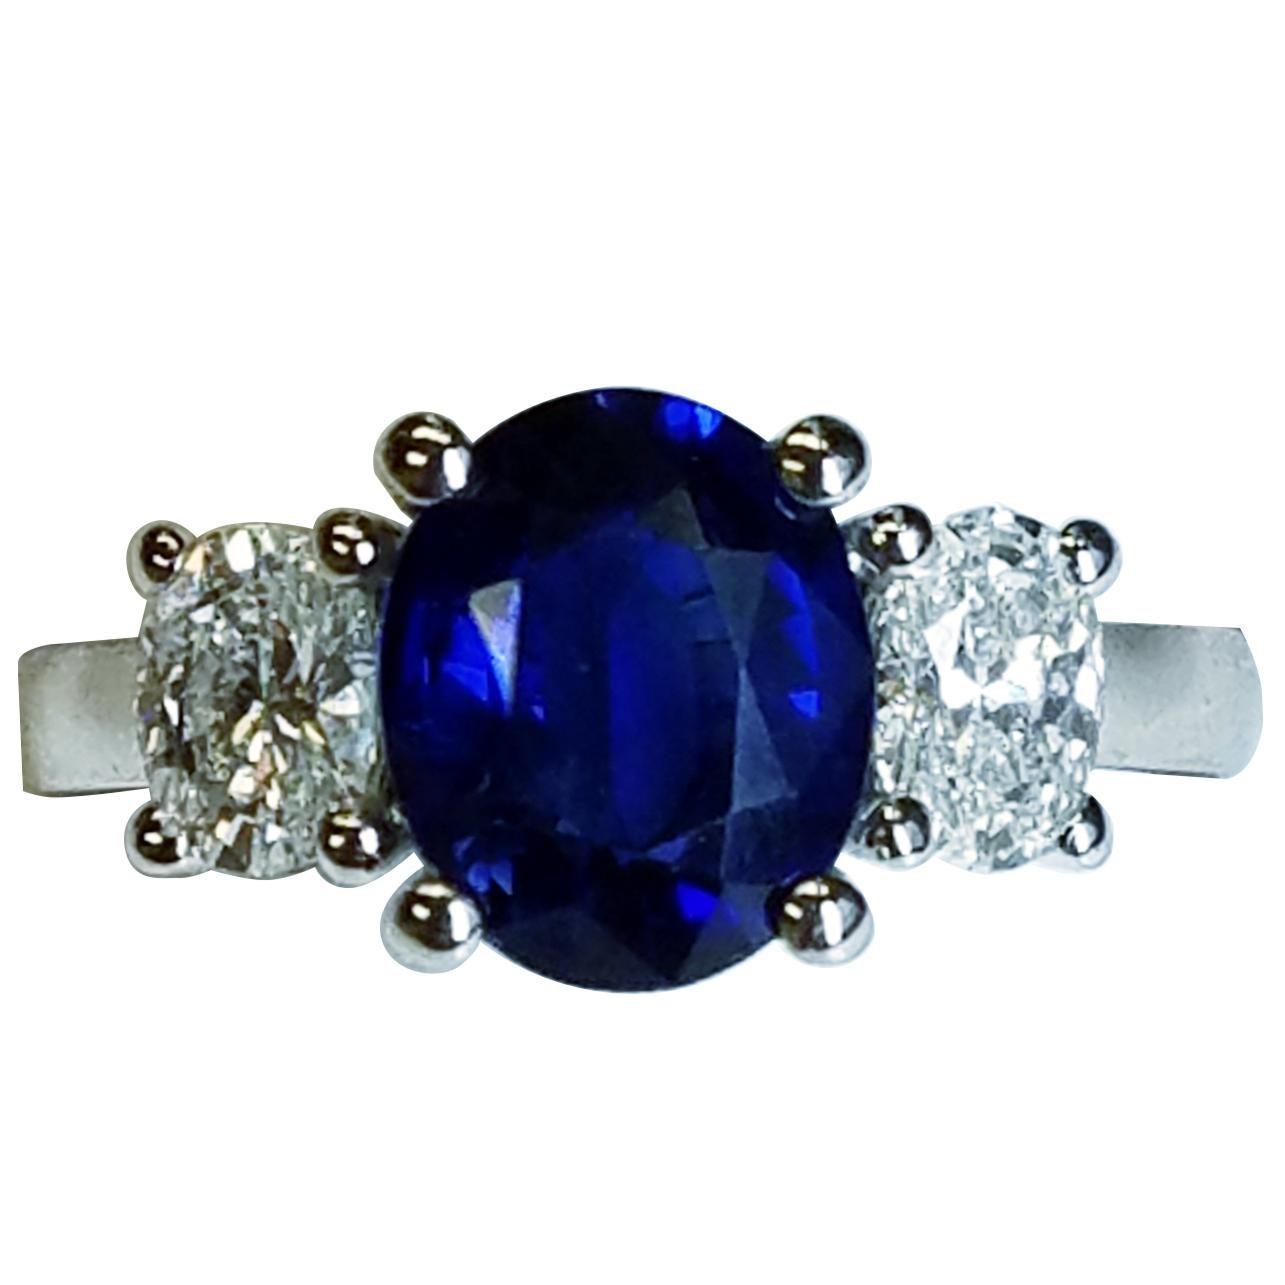 Platinum Three-Stone Oval Cut Blue Sapphire and Diamond Ring